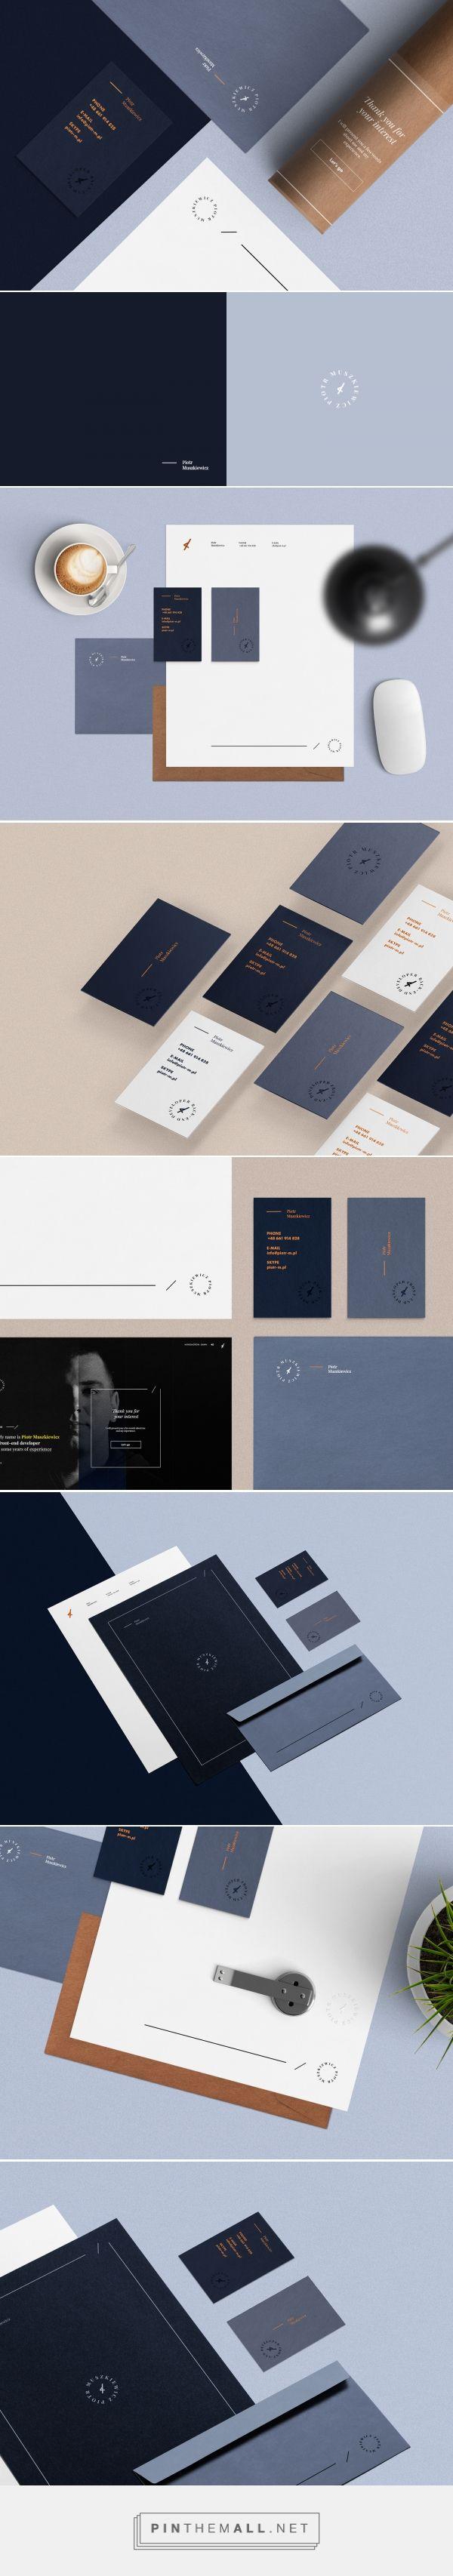 Piotr Muszkiewicz Developer Branding by Tomasz Mazurczak   Fivestar Branding Agency – Design and Branding Agency & Curated Inspiration Gallery